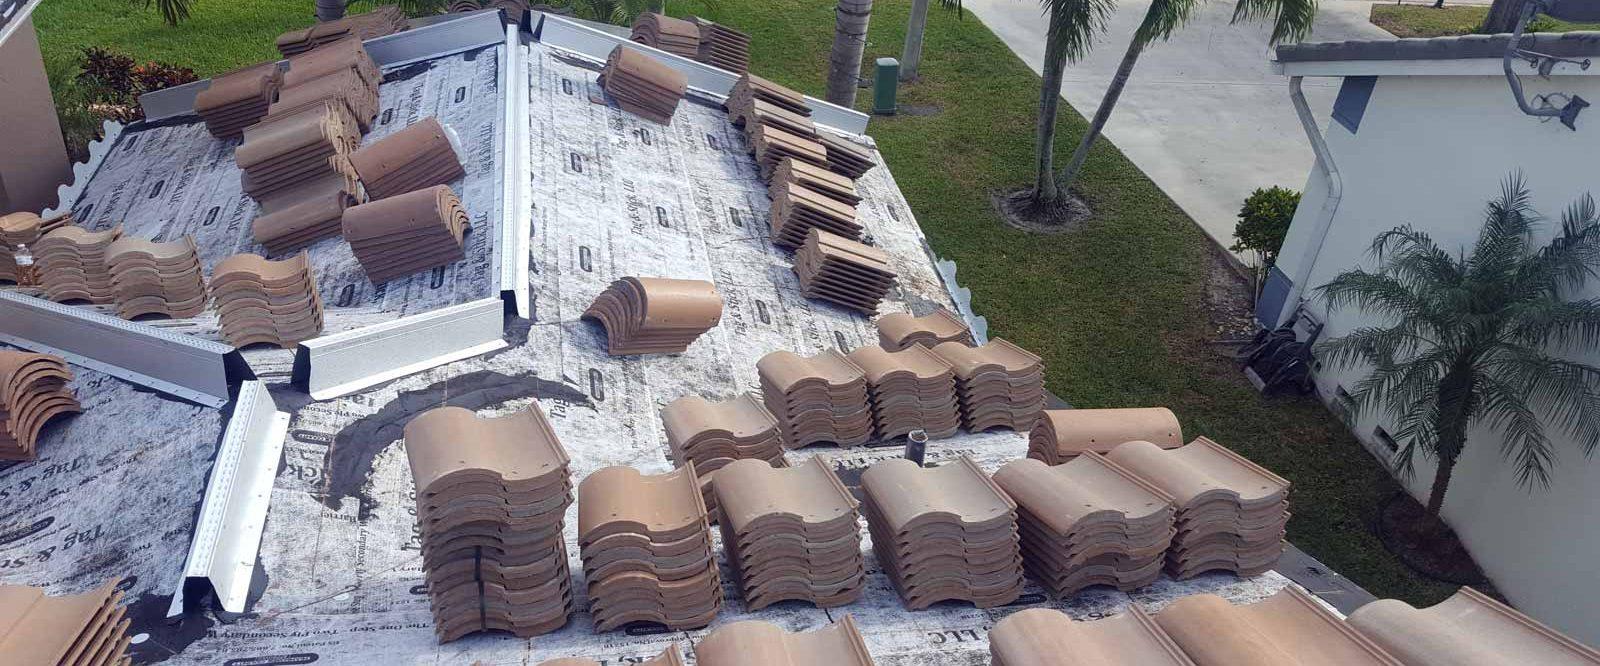 tile stacks on roof